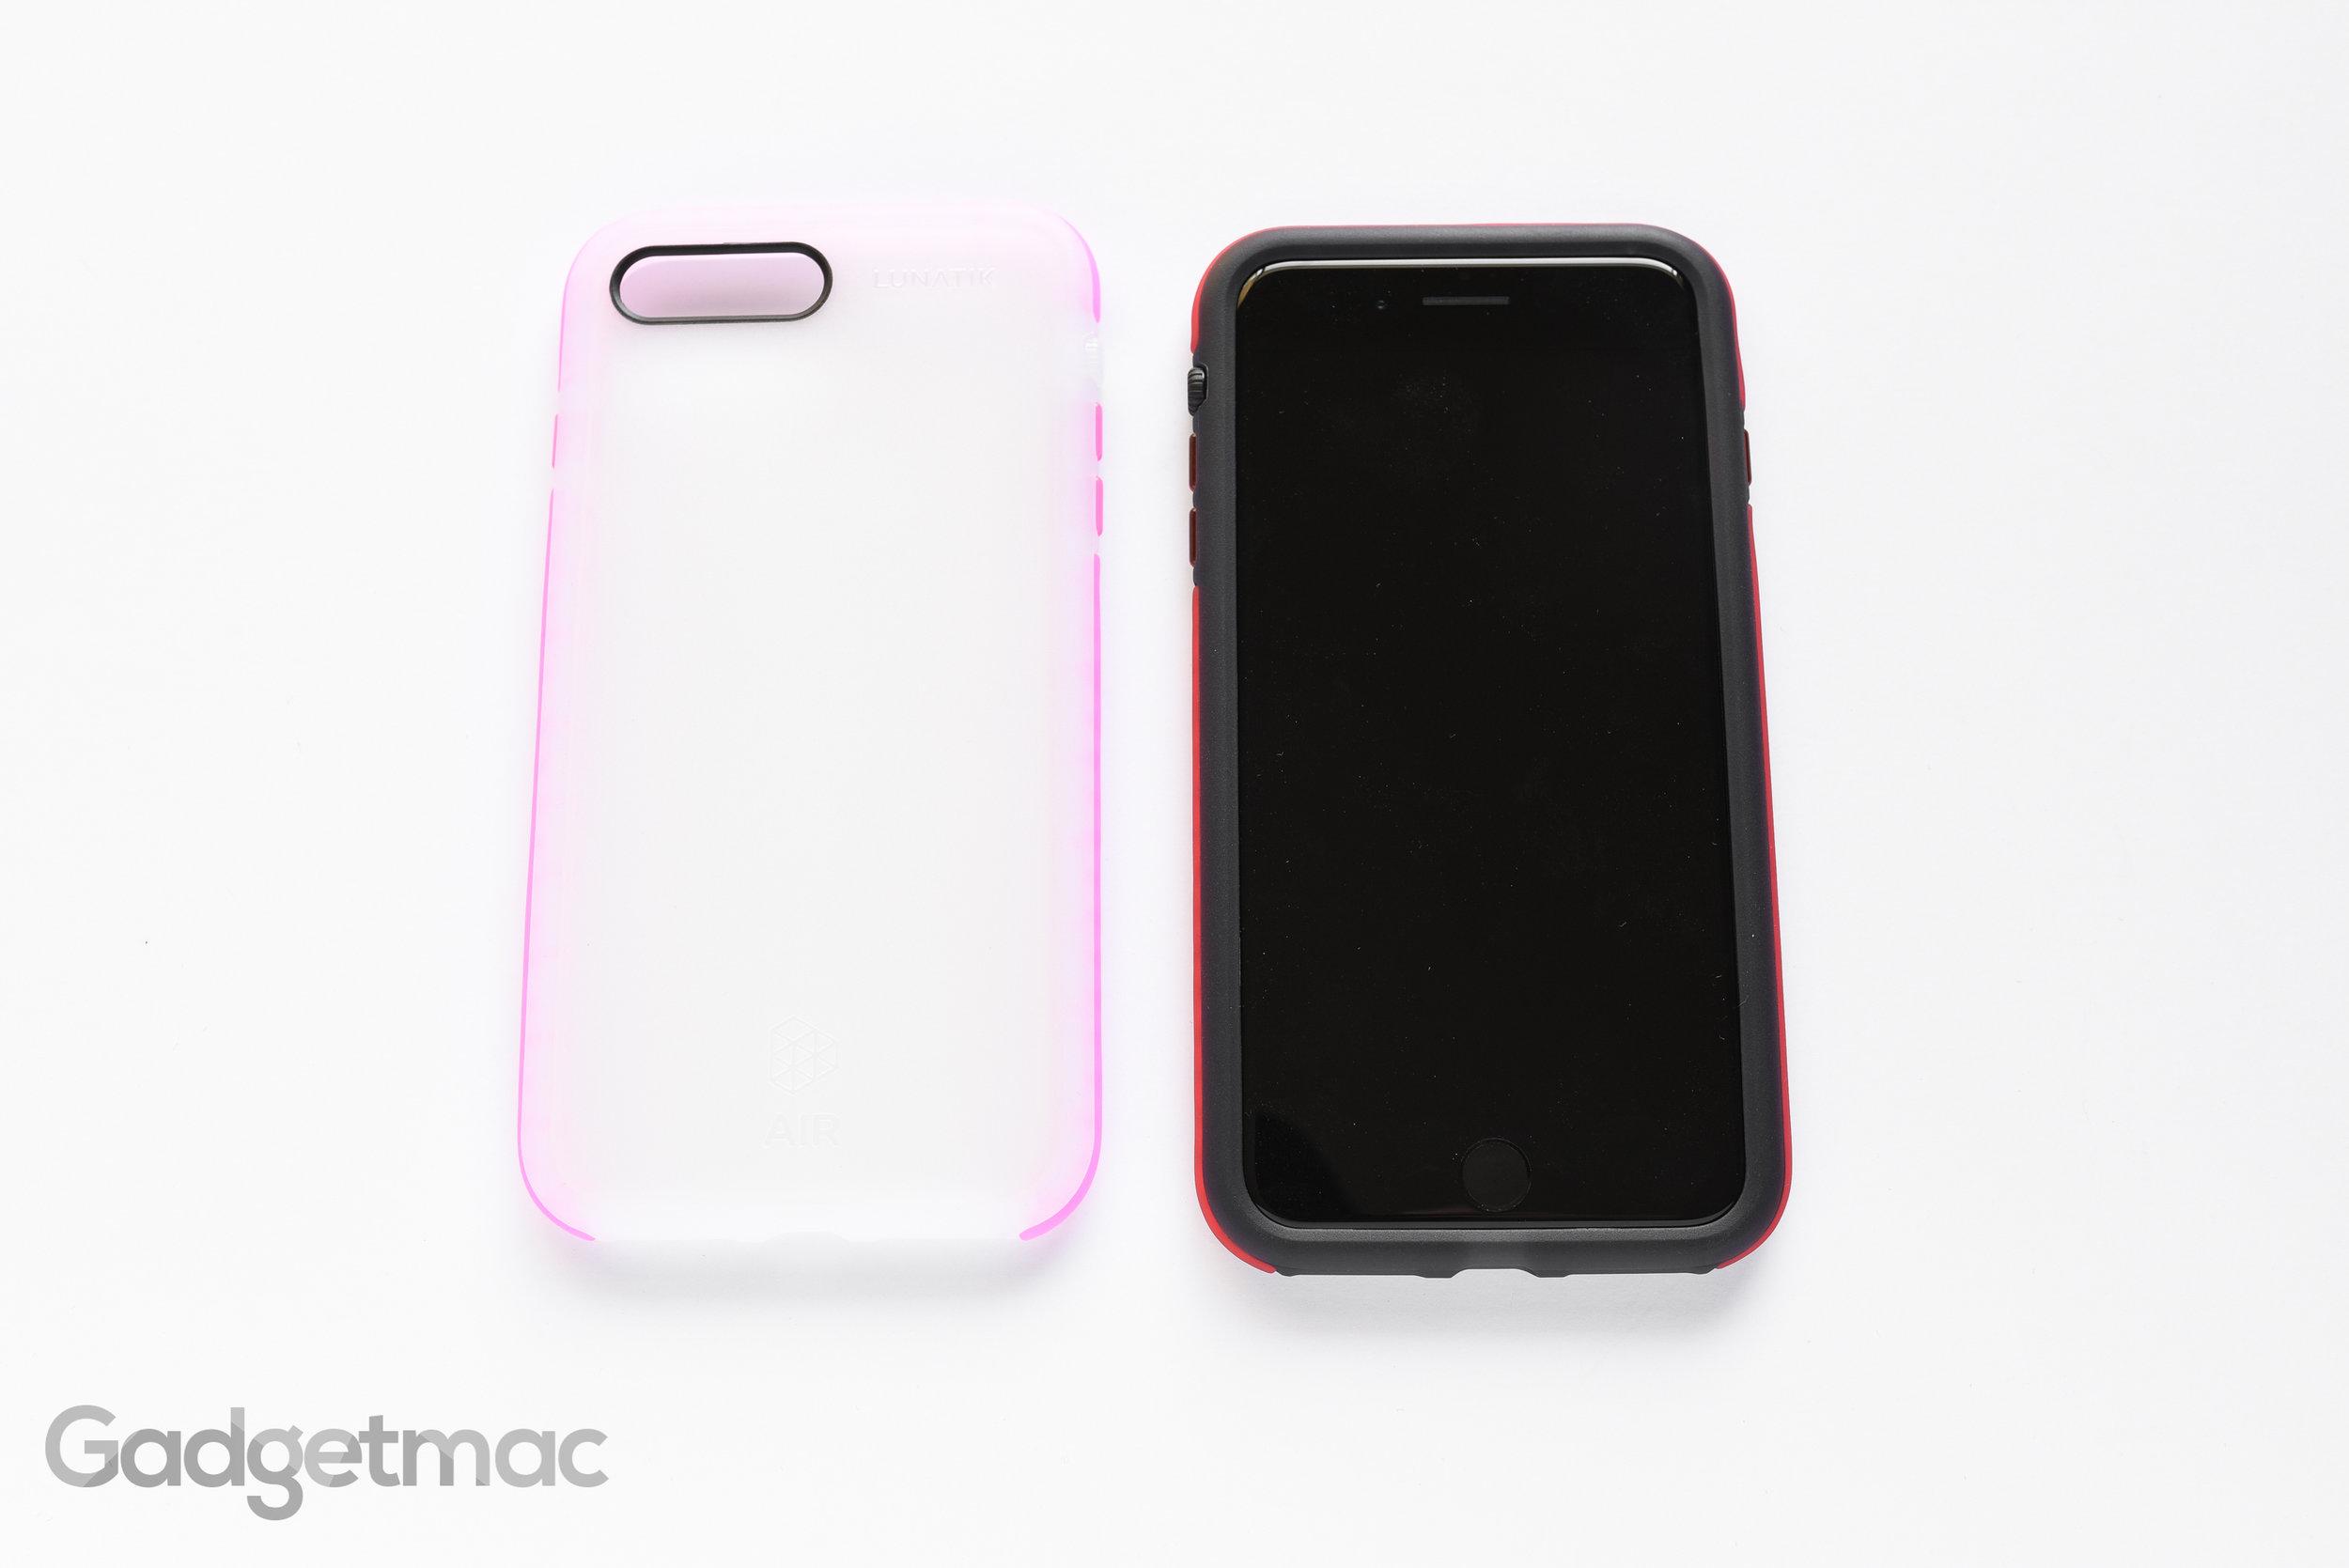 lunatik-air-iphone-7-plus-case-front.jpg